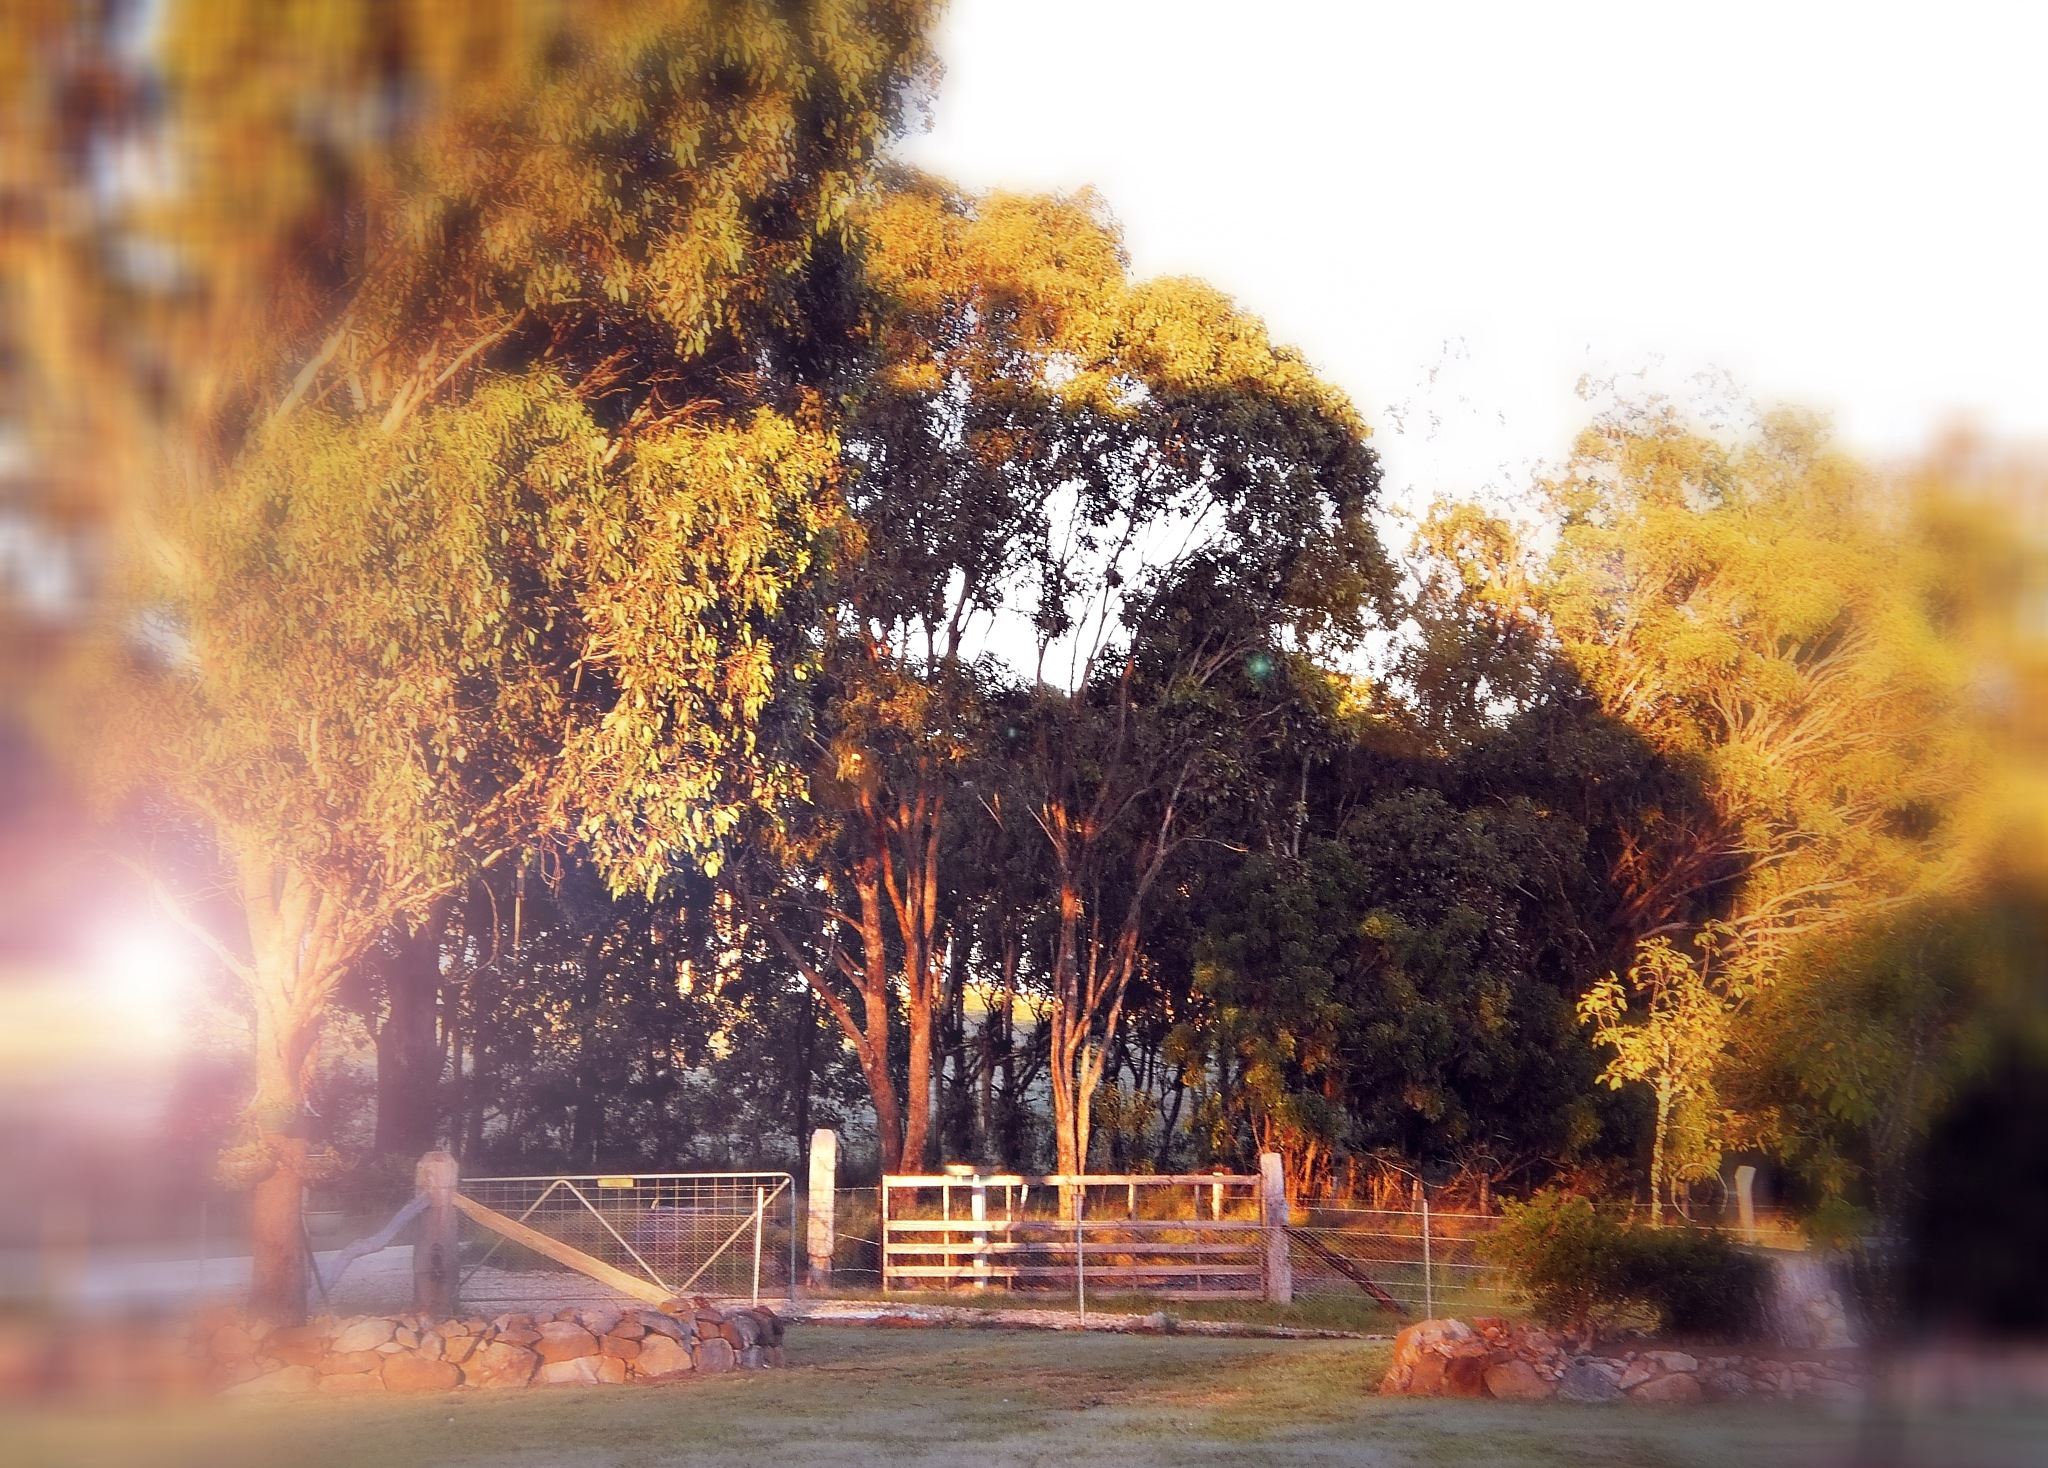 A GOLDEN MORNING by  Dianne J. Larsen